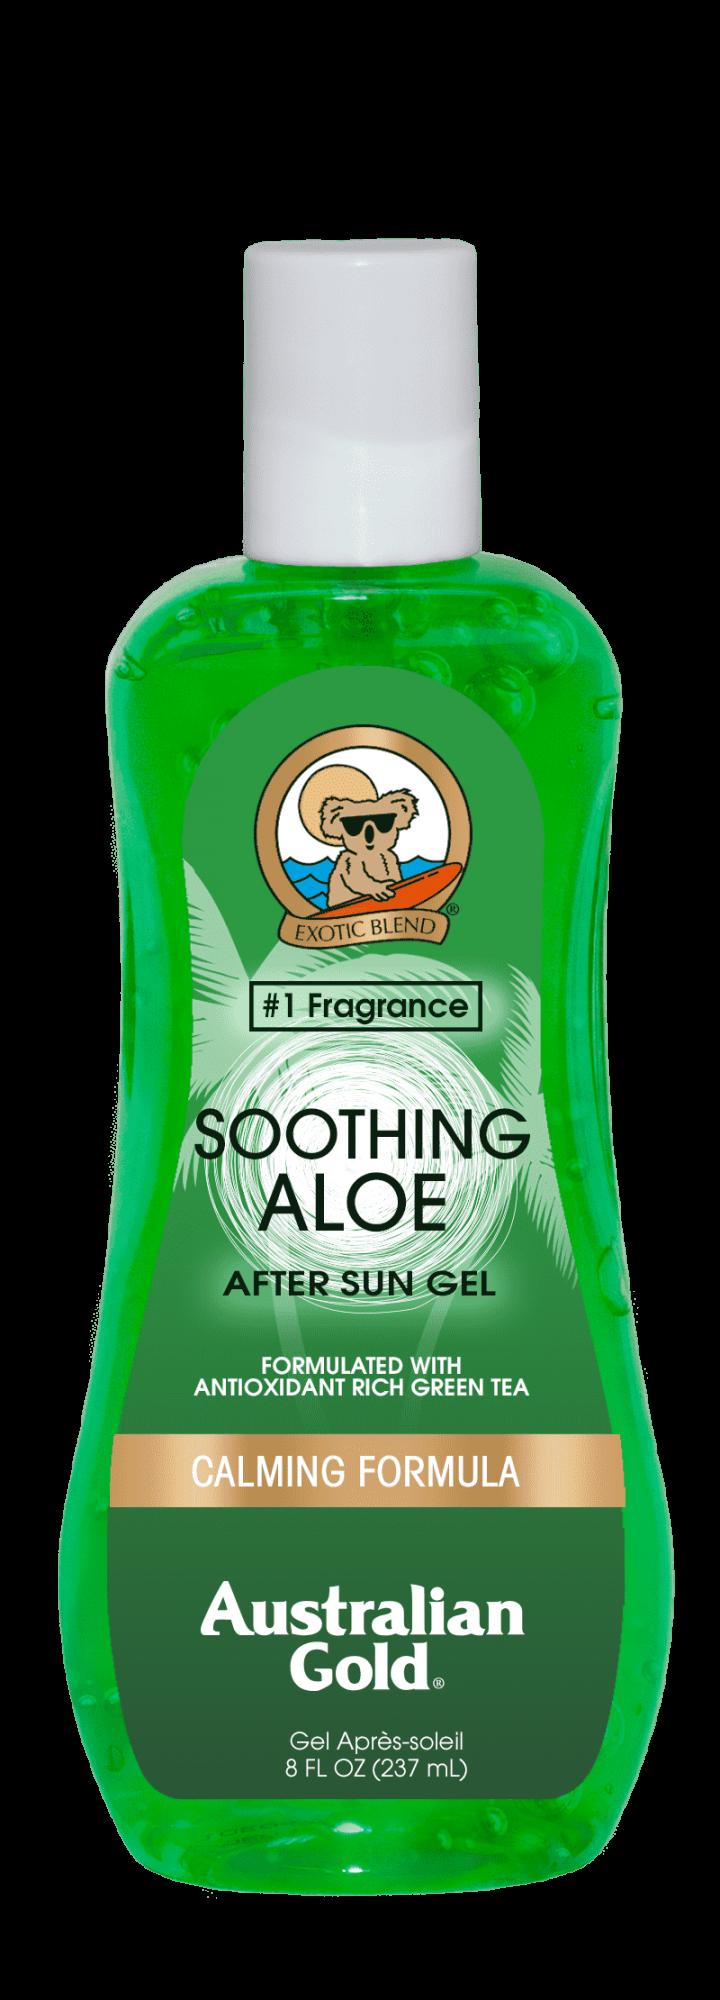 Australian Gold Pós Sol Soothing Aloe Gel 237ml